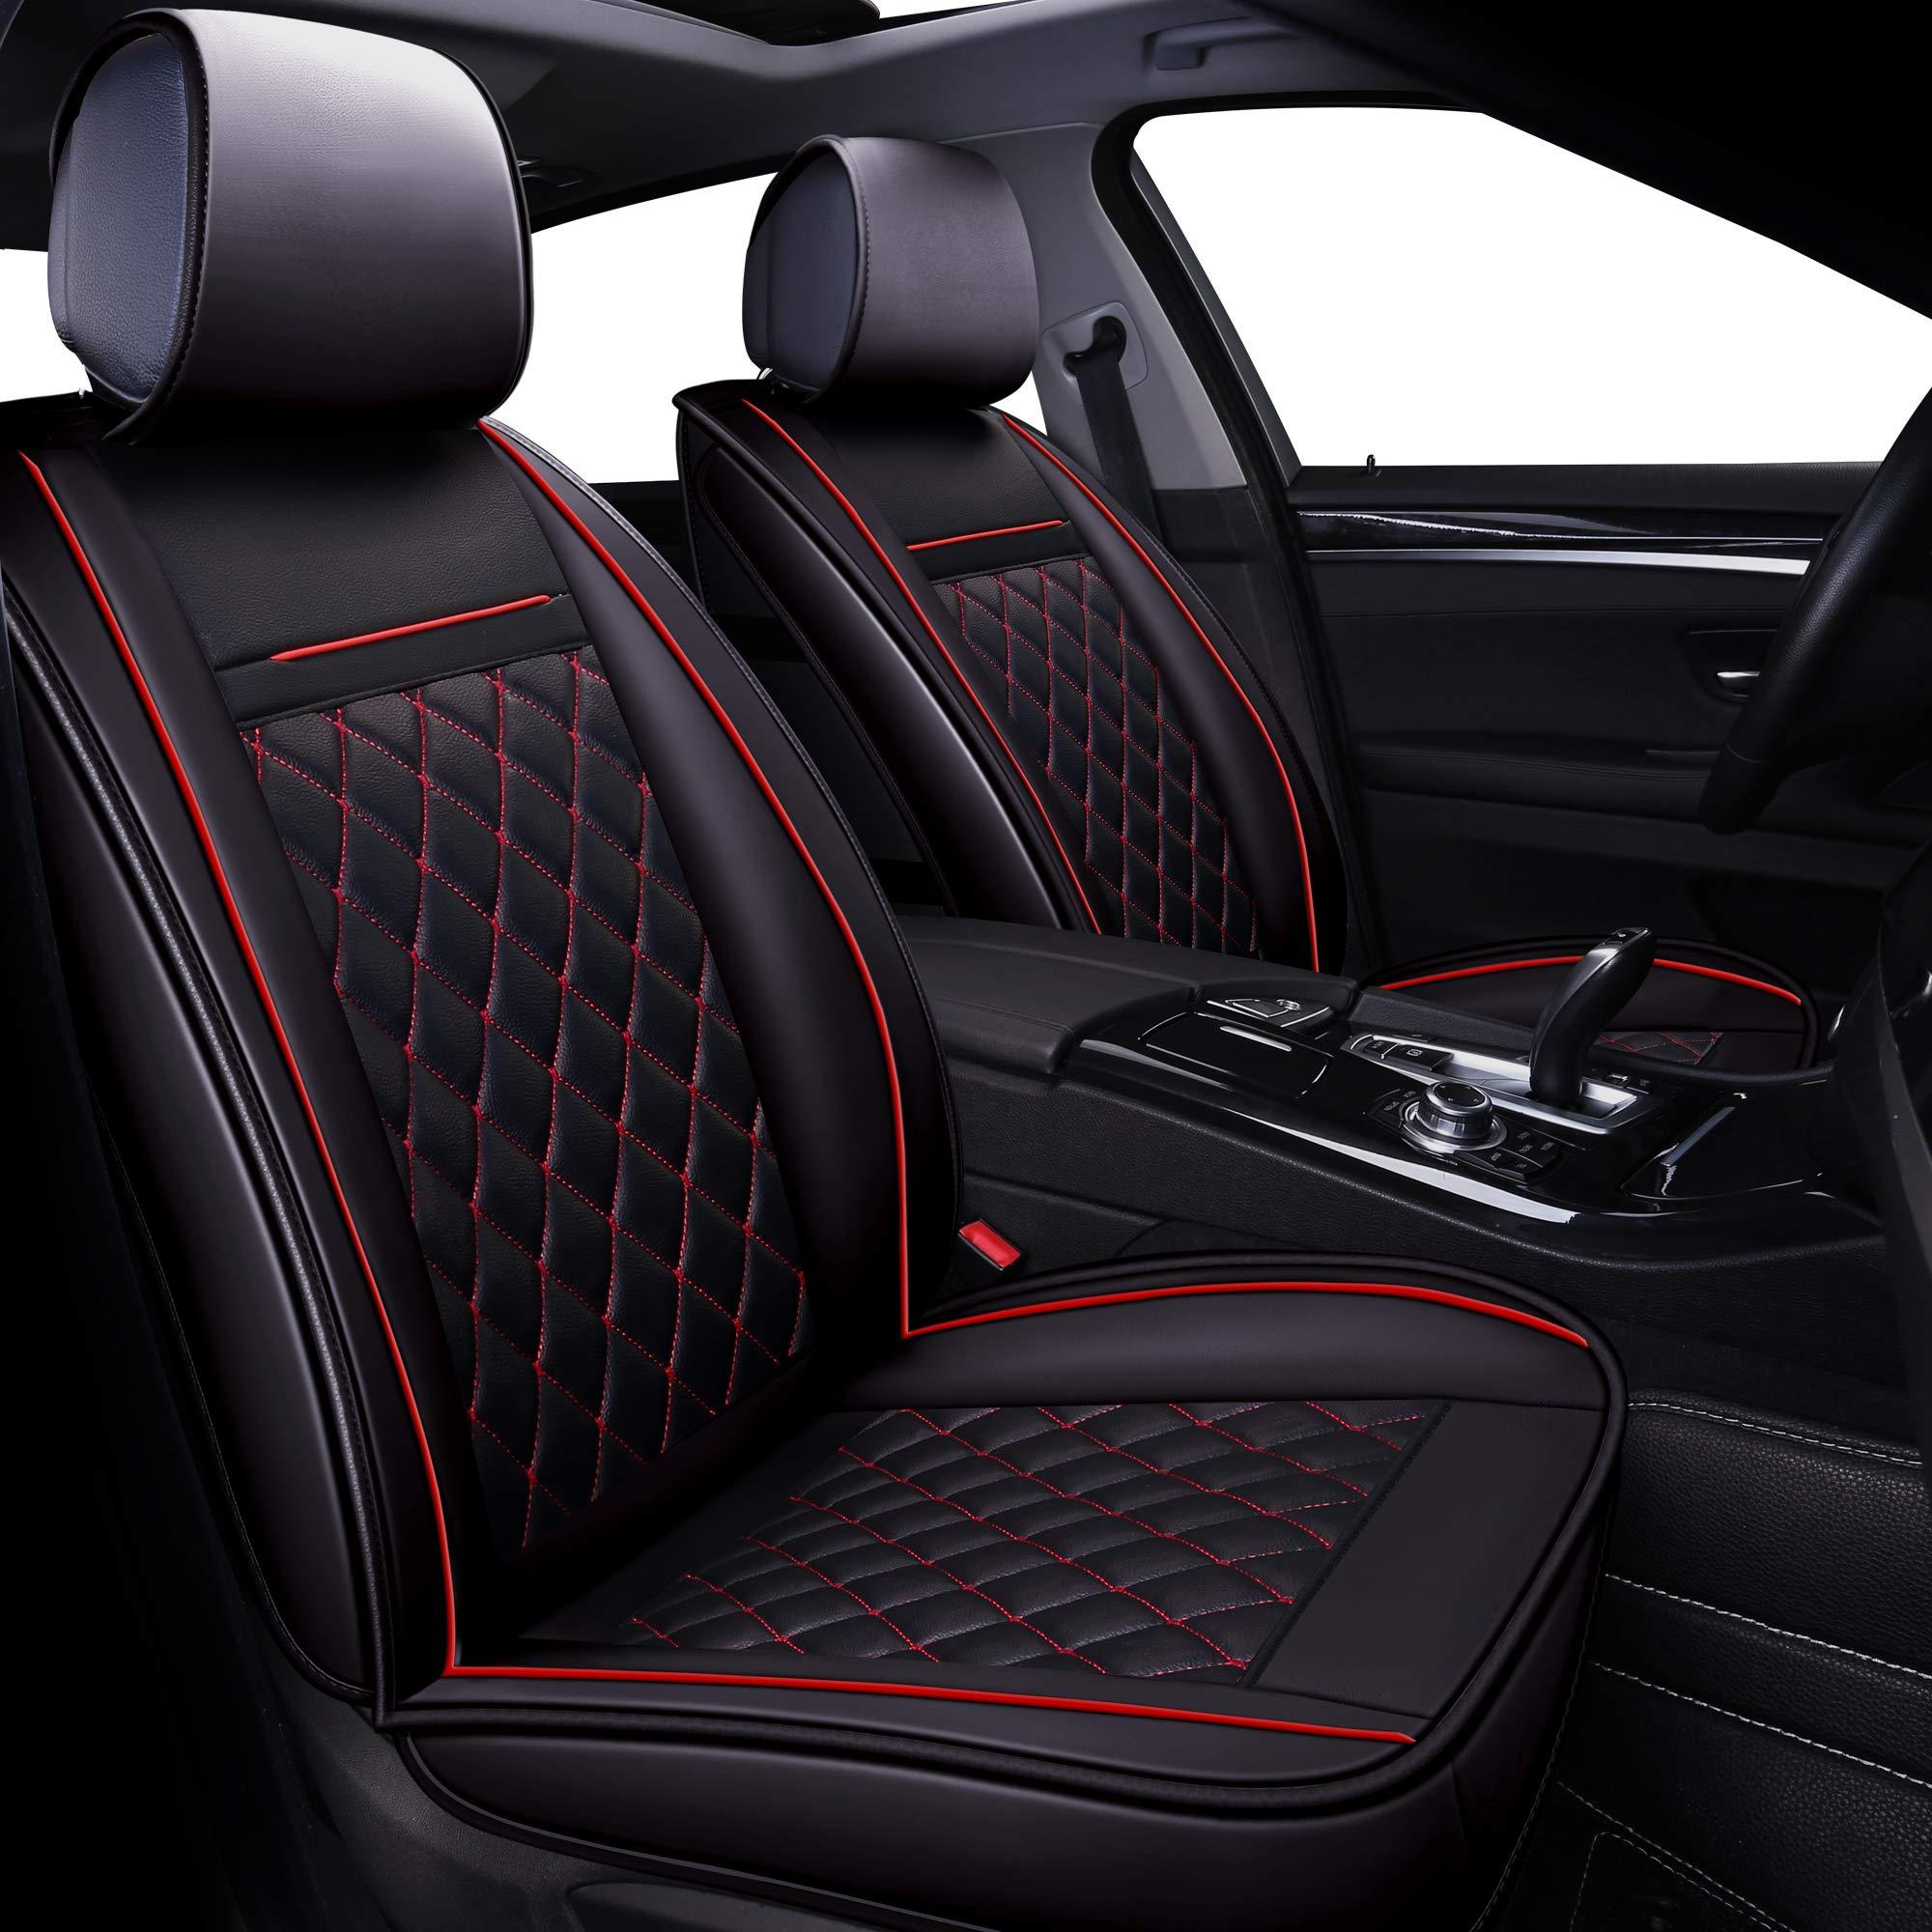 Luckyman Club Car Seat Covers Fit Most Sedan Suv Truck